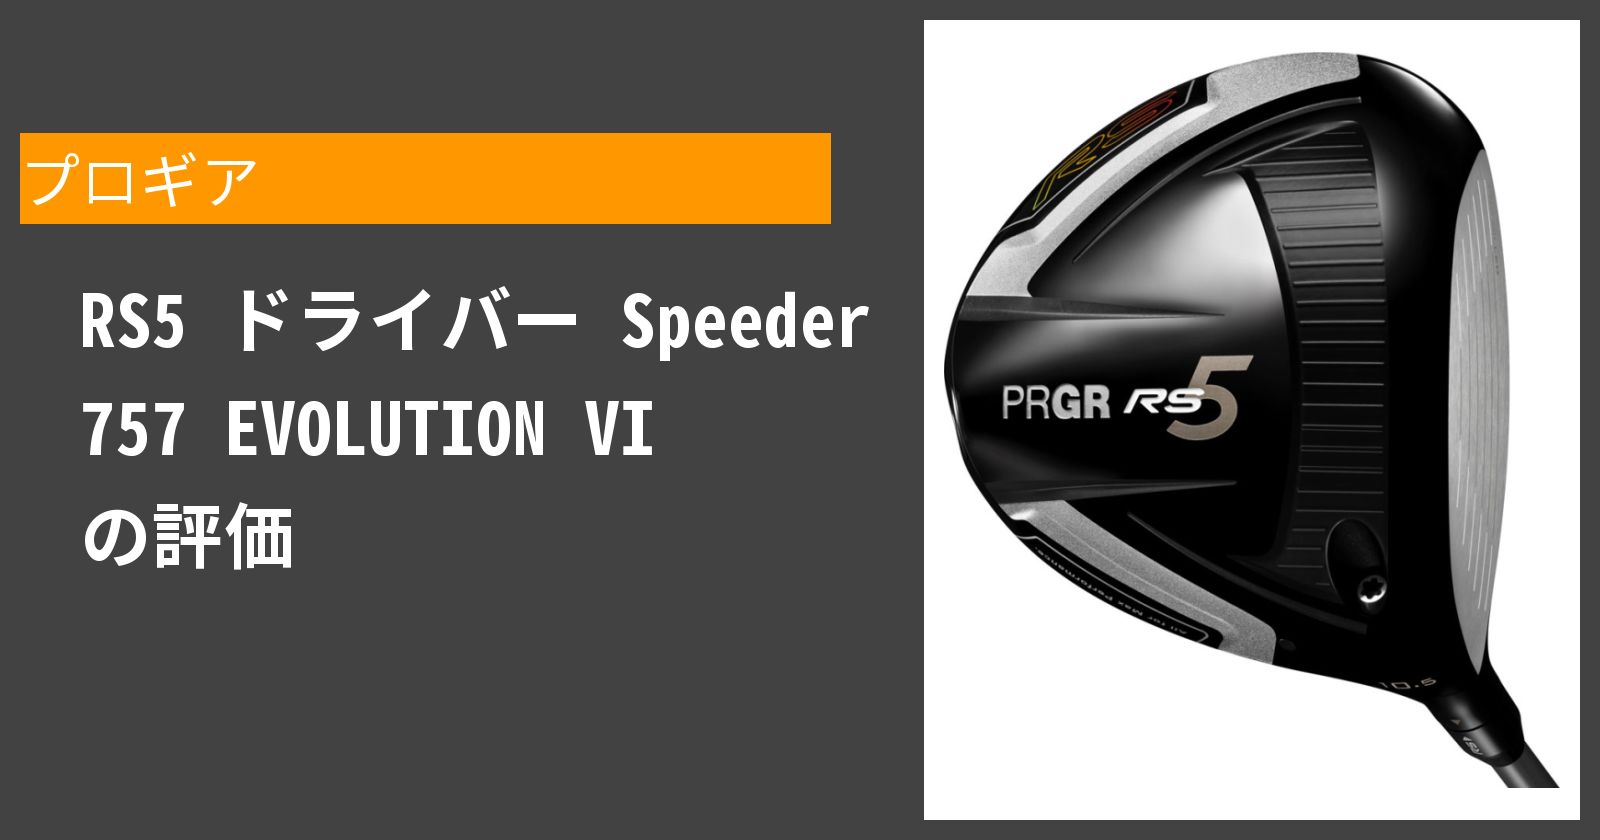 RS5 ドライバー Speeder 757 EVOLUTION VIを徹底評価